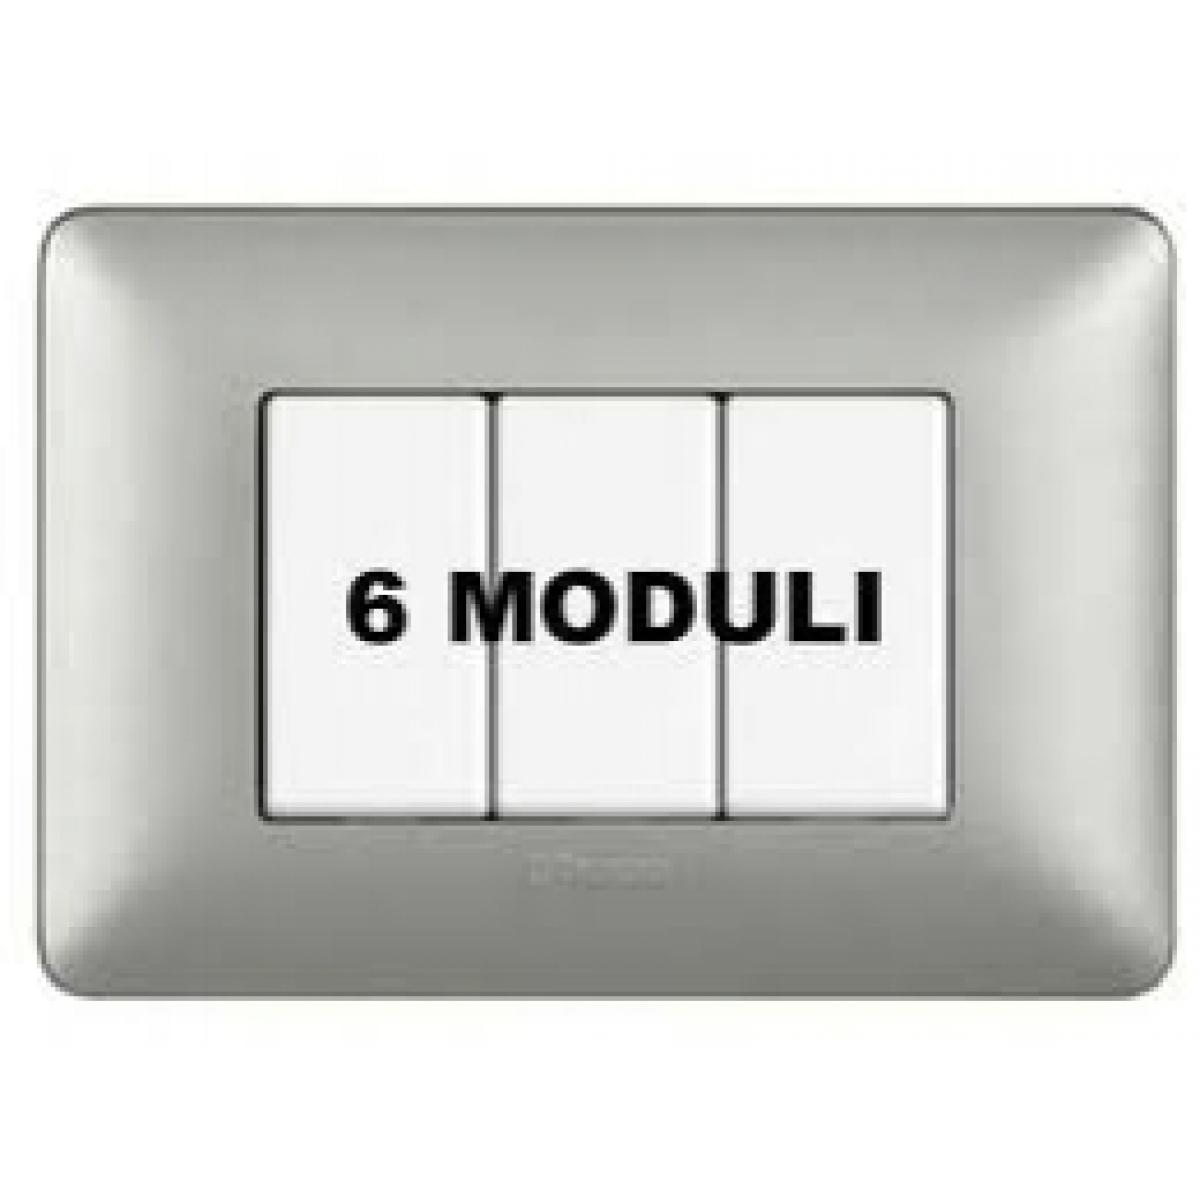 Placca 6 Moduli Silver Bticino Matix AM4806MSL